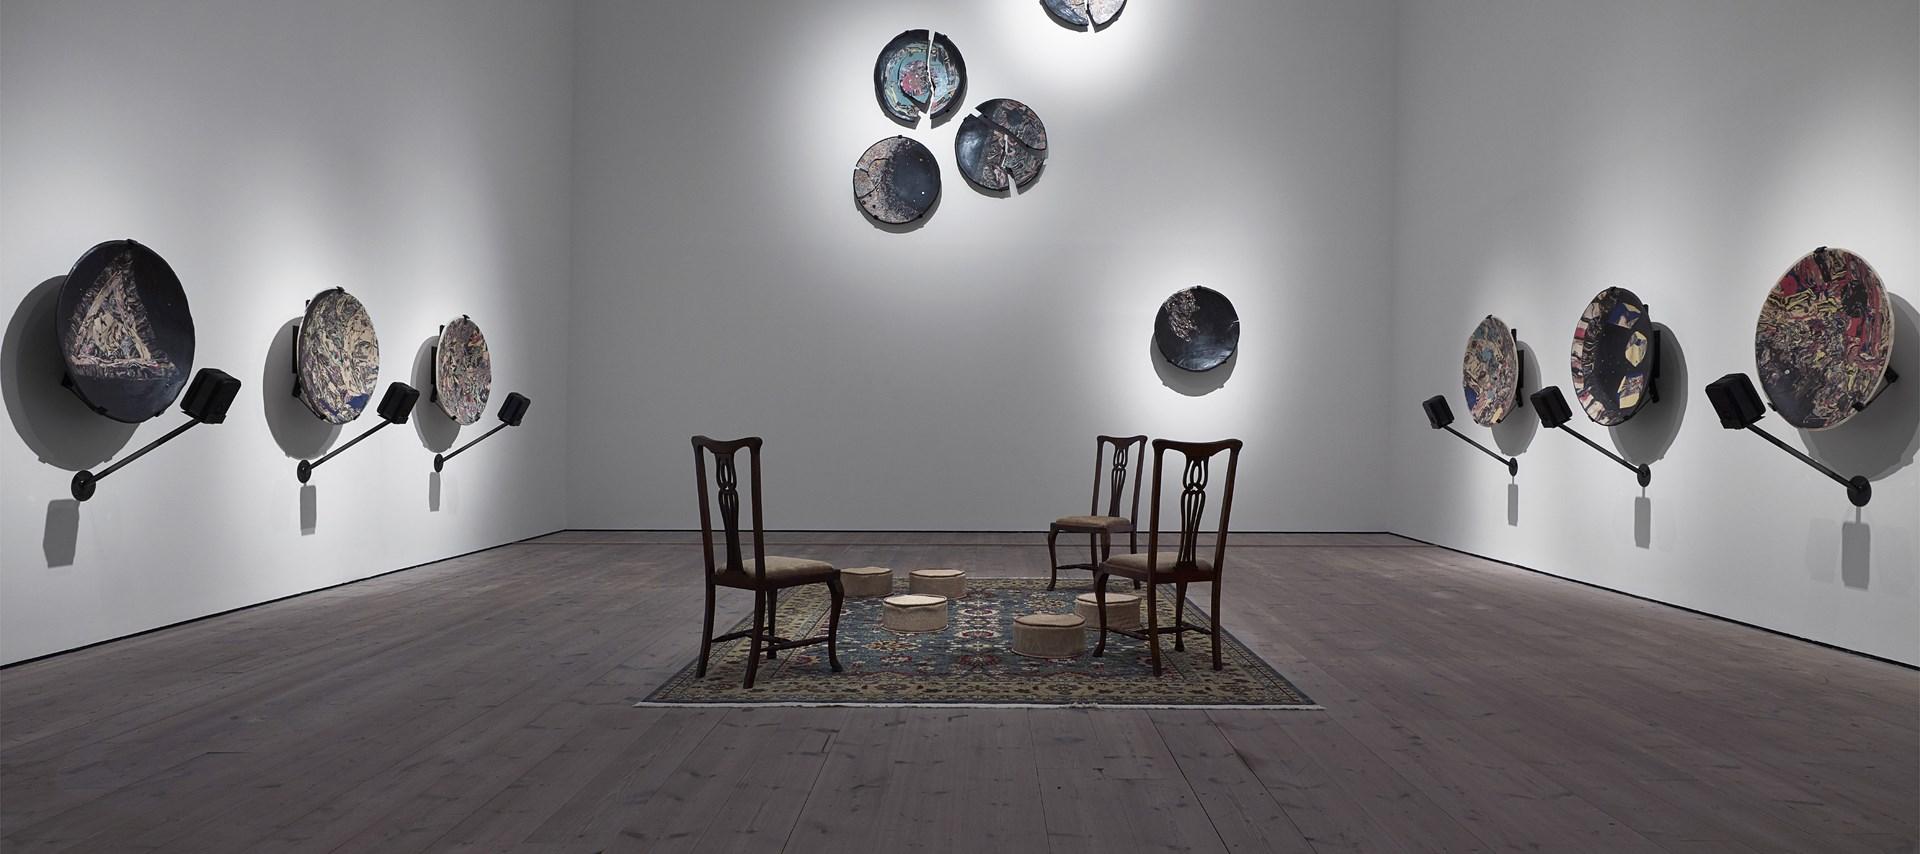 Serena Korda: Missing Time: Installation View. Image credit: John McKenzie © BALTIC